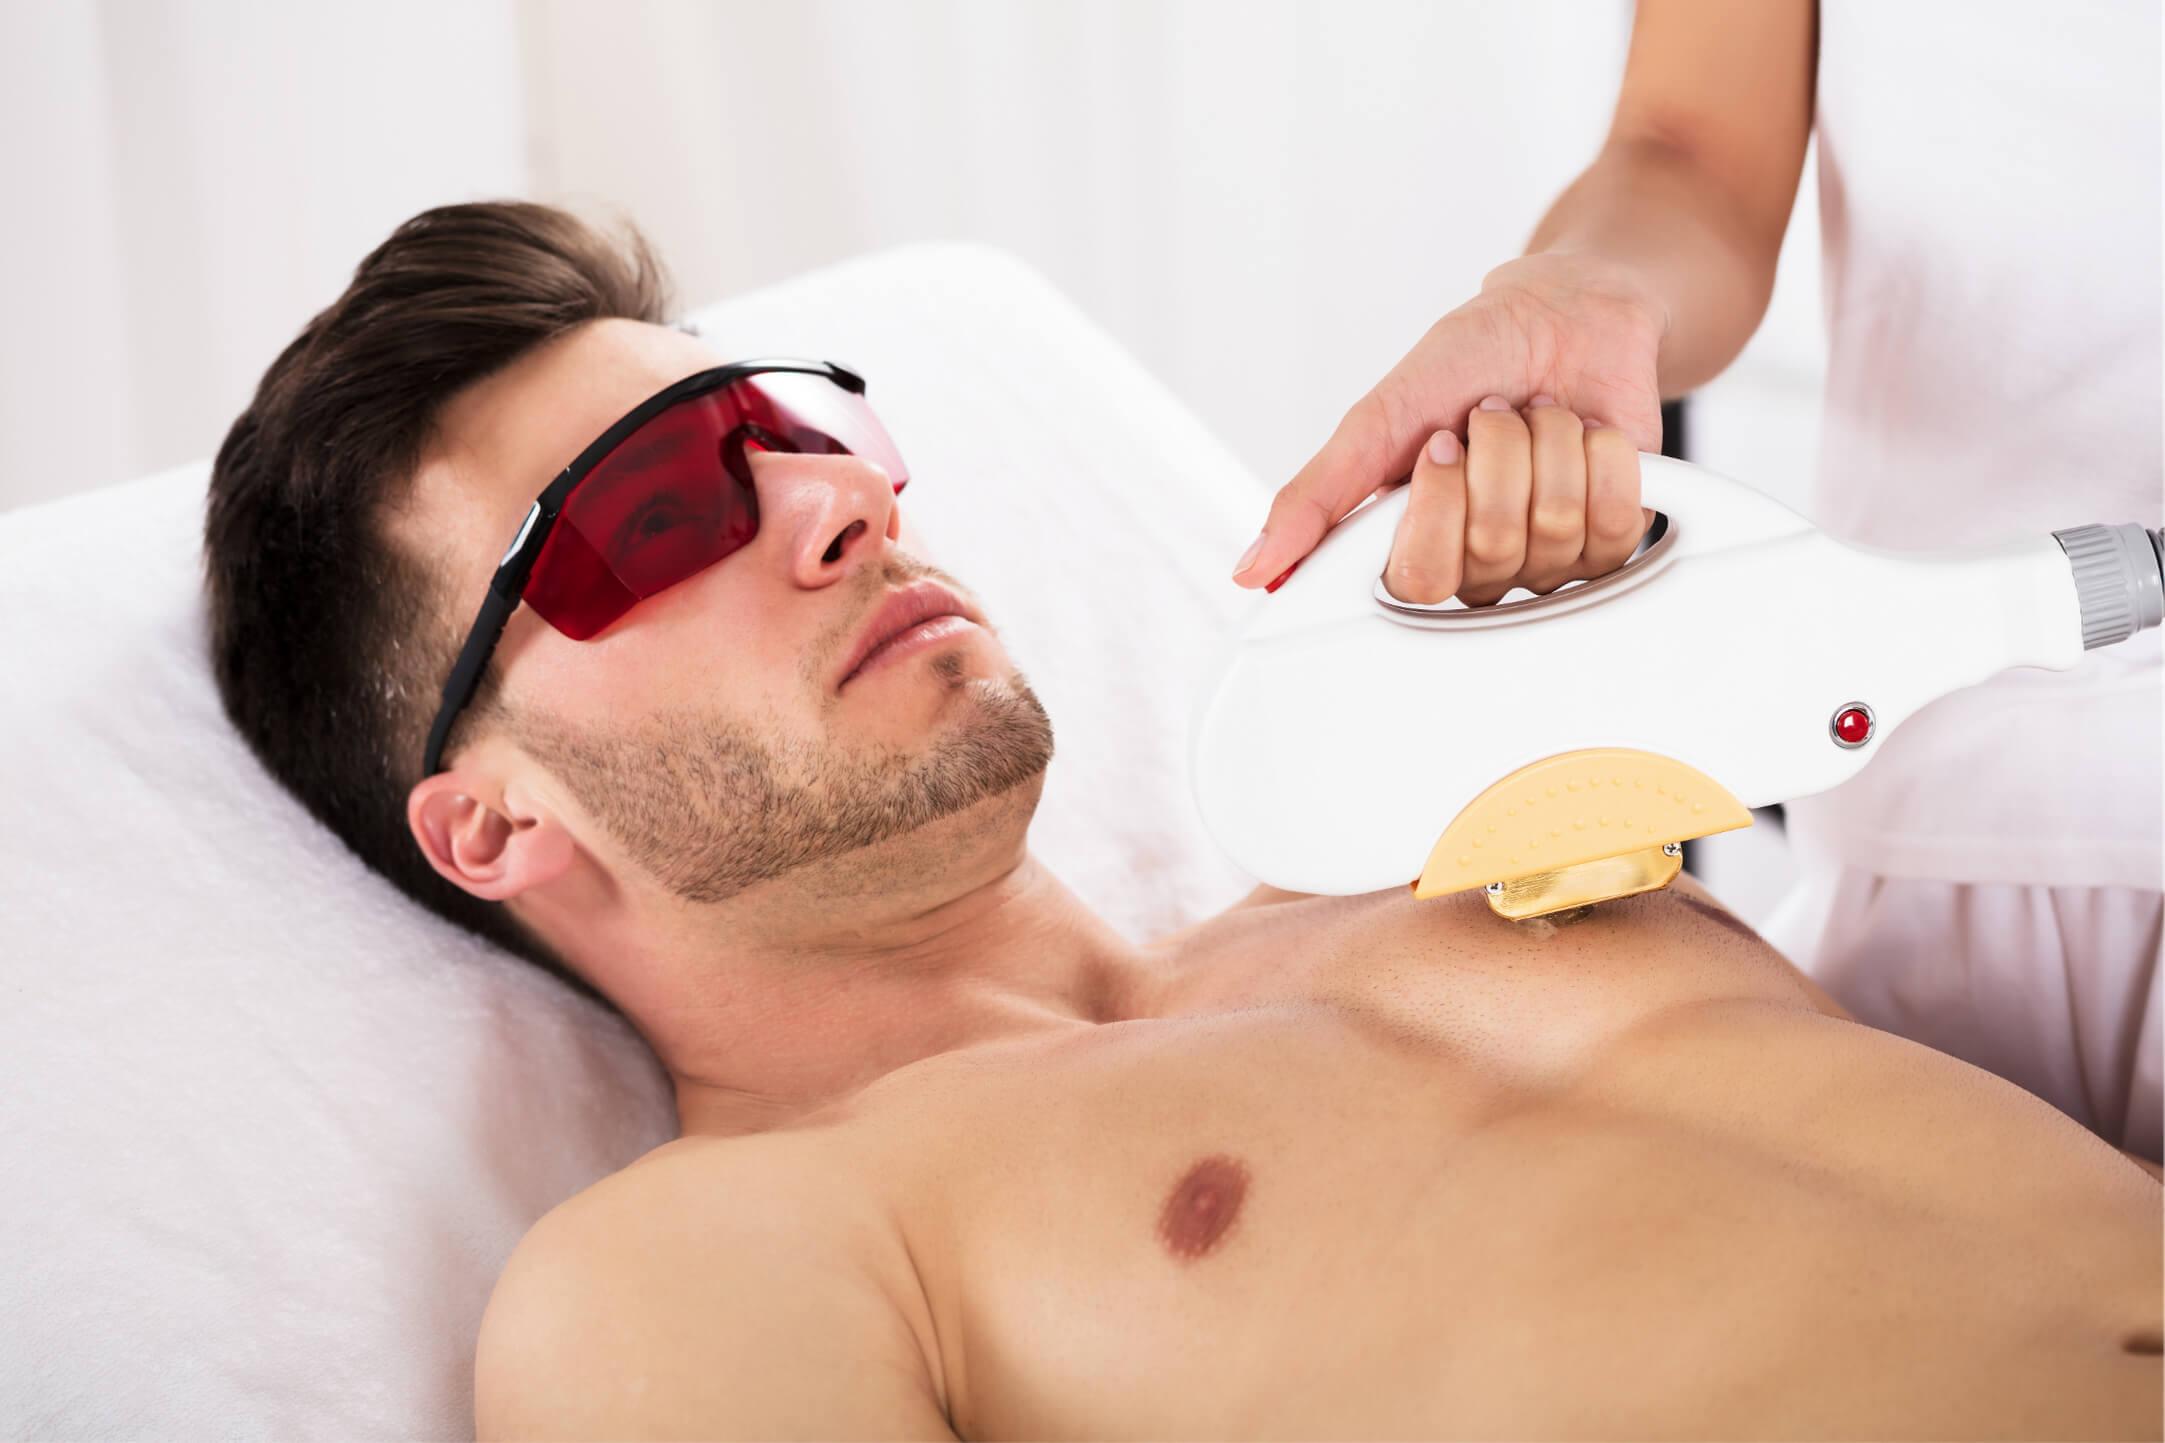 intense-pulsed-light-treatment